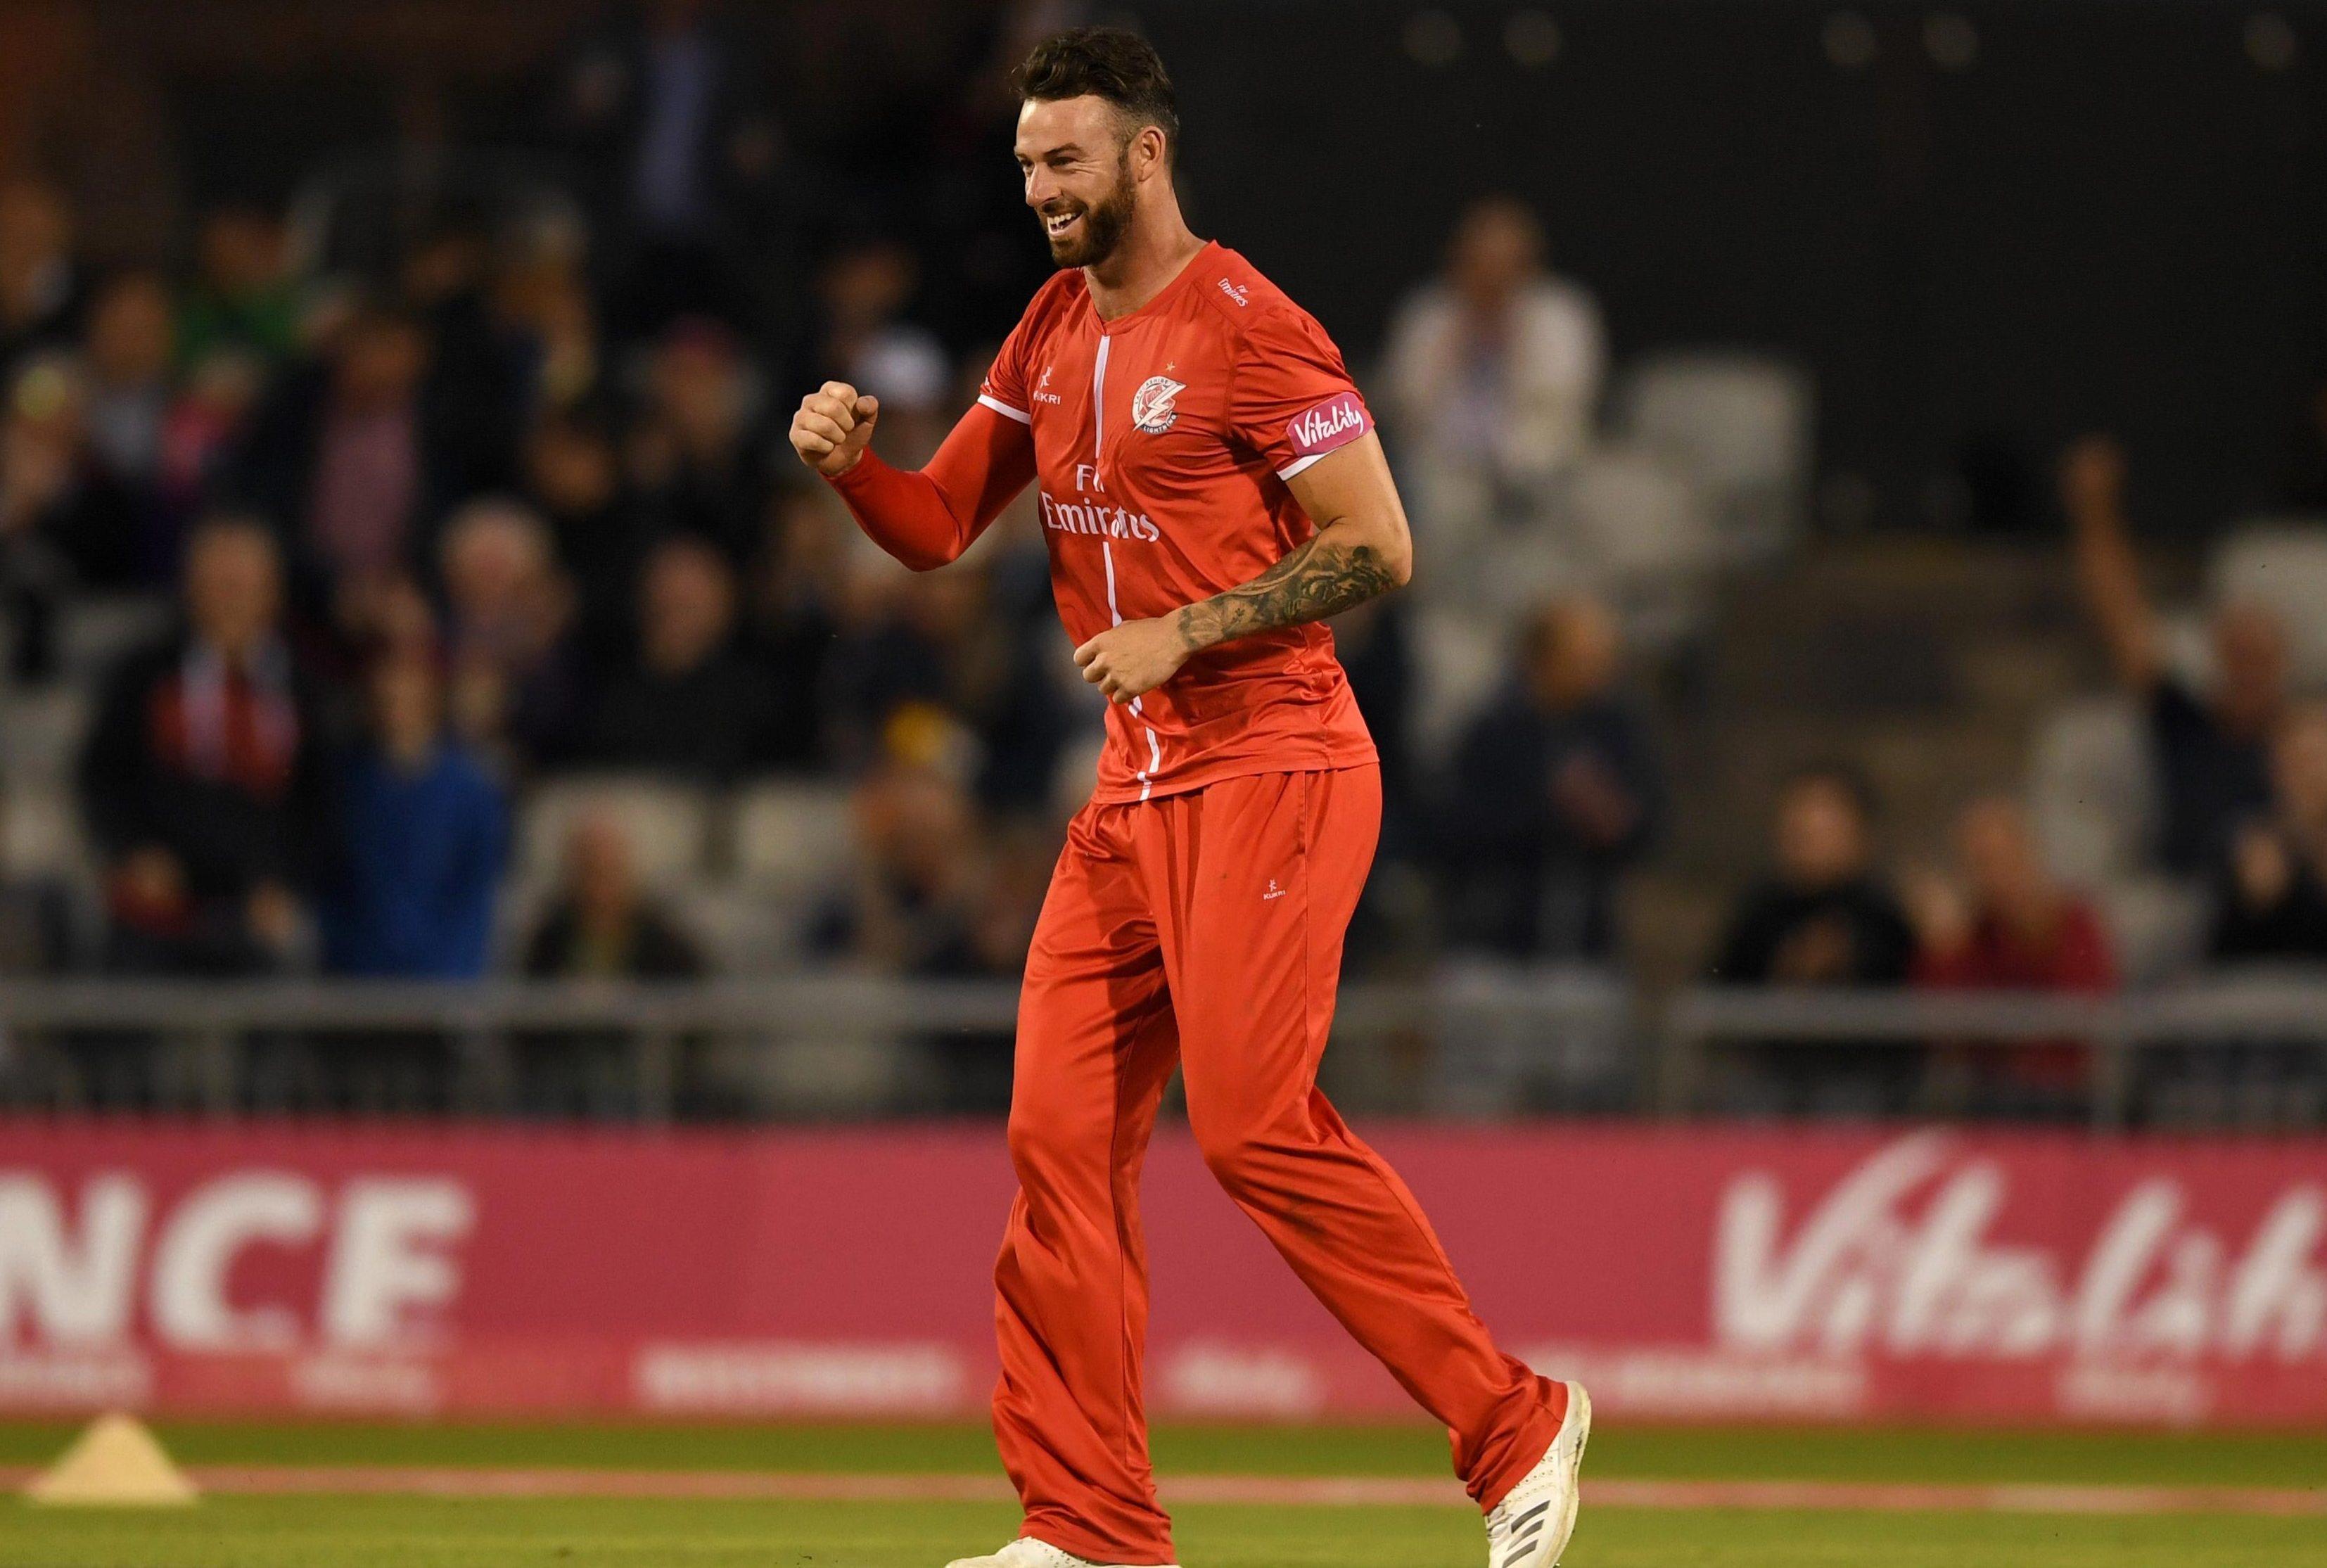 Jordan Clark celebrates the wicket of big-hitting Liam Plunkett